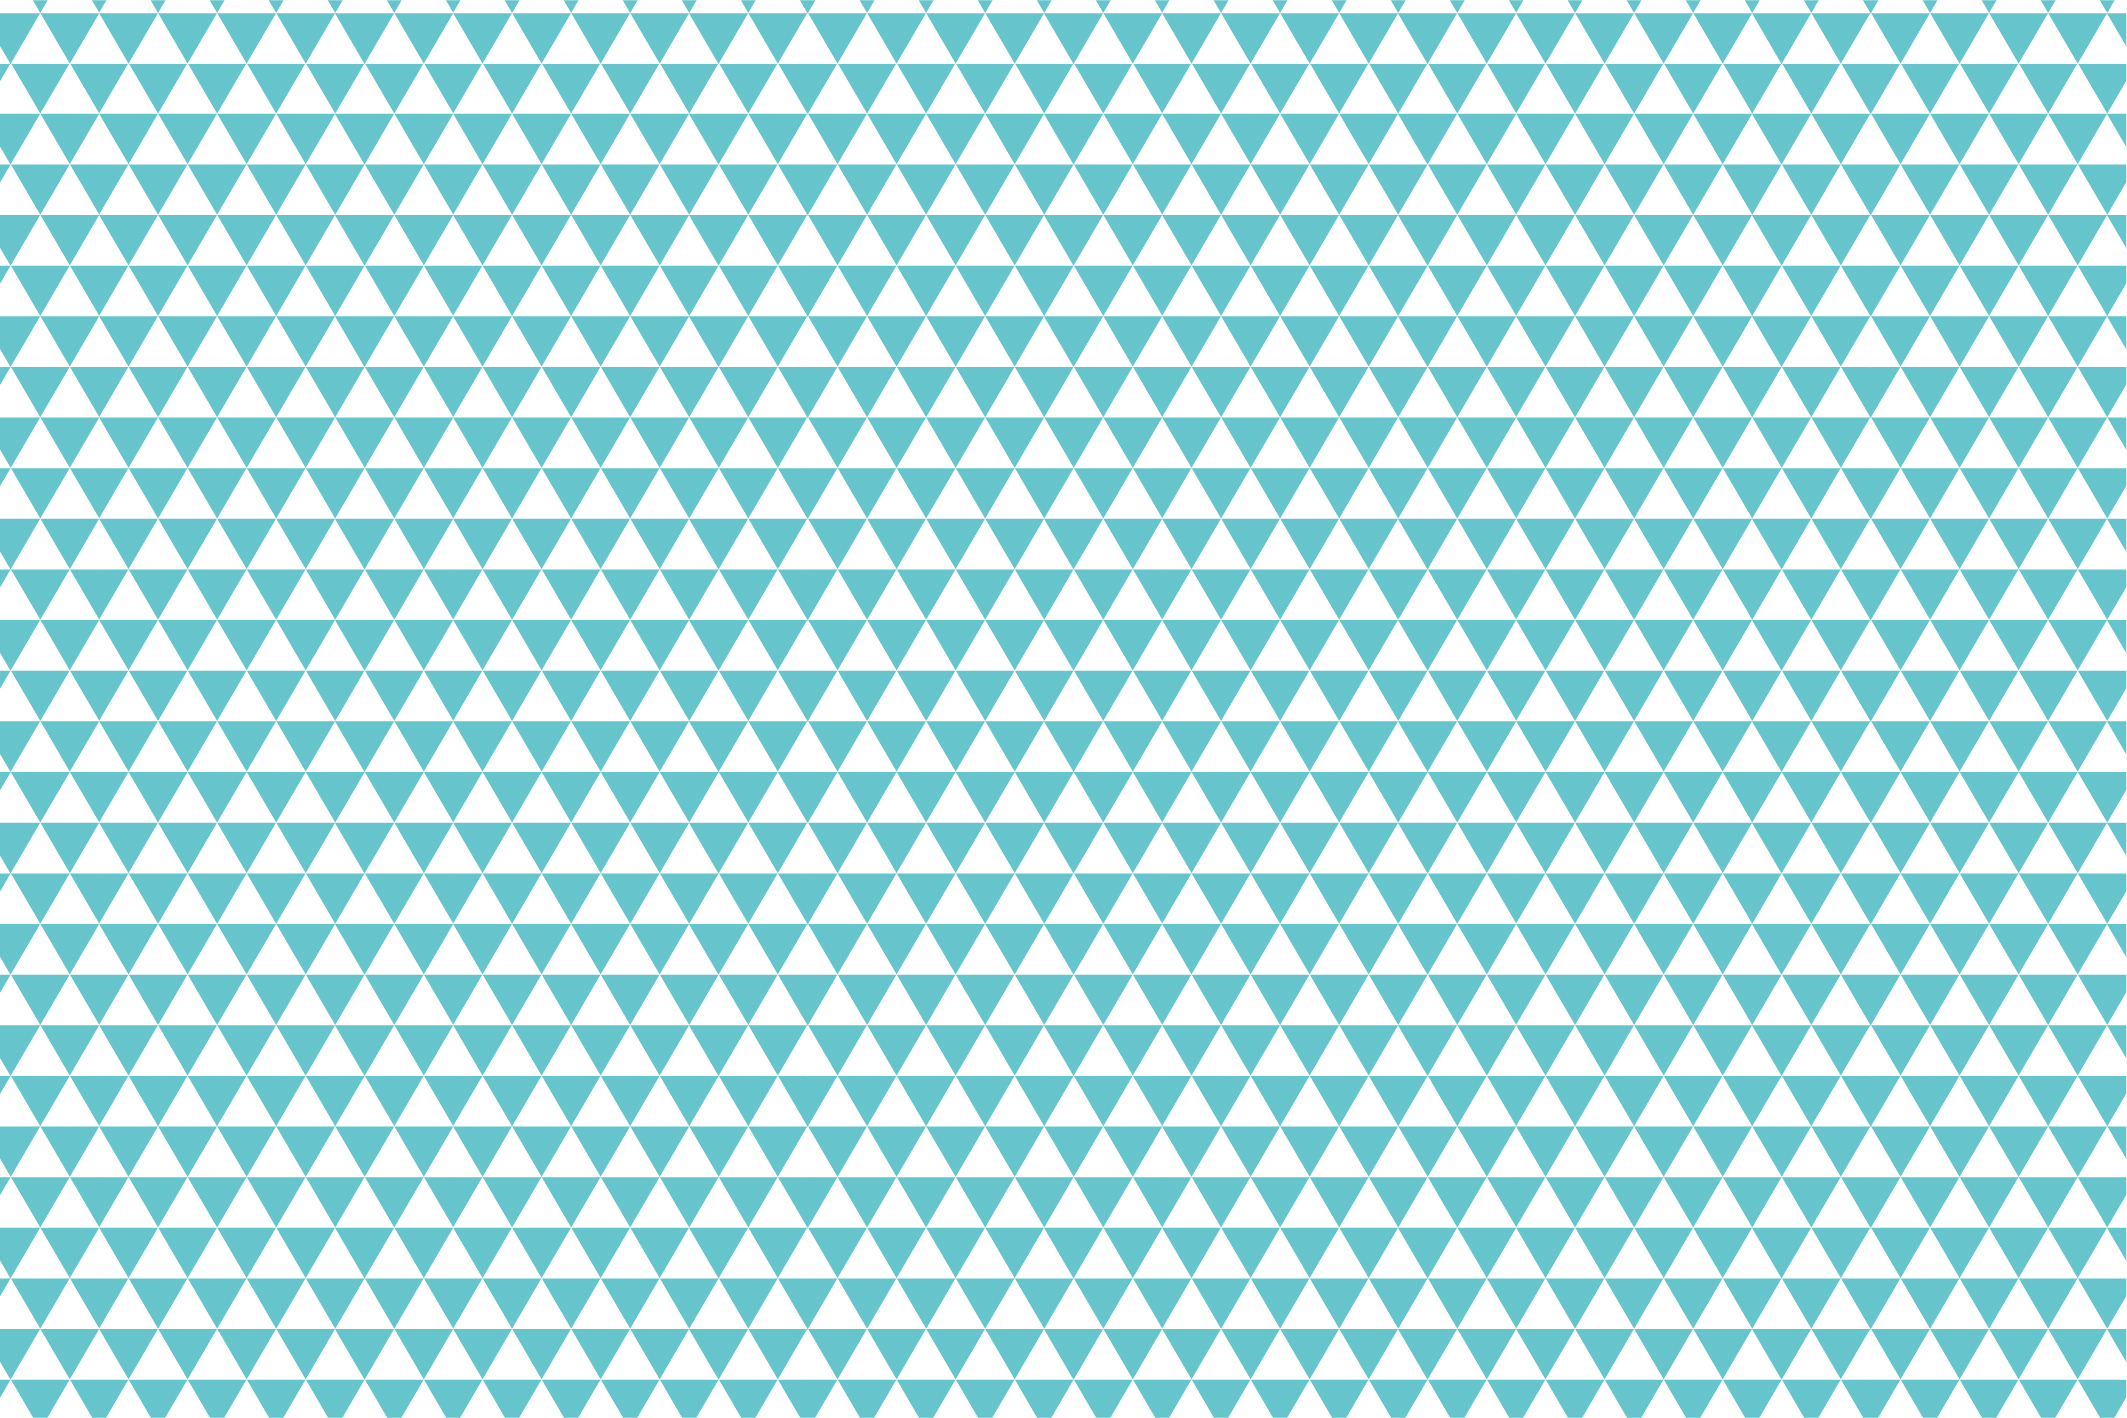 Modern geometric seamless patterns. example image 4